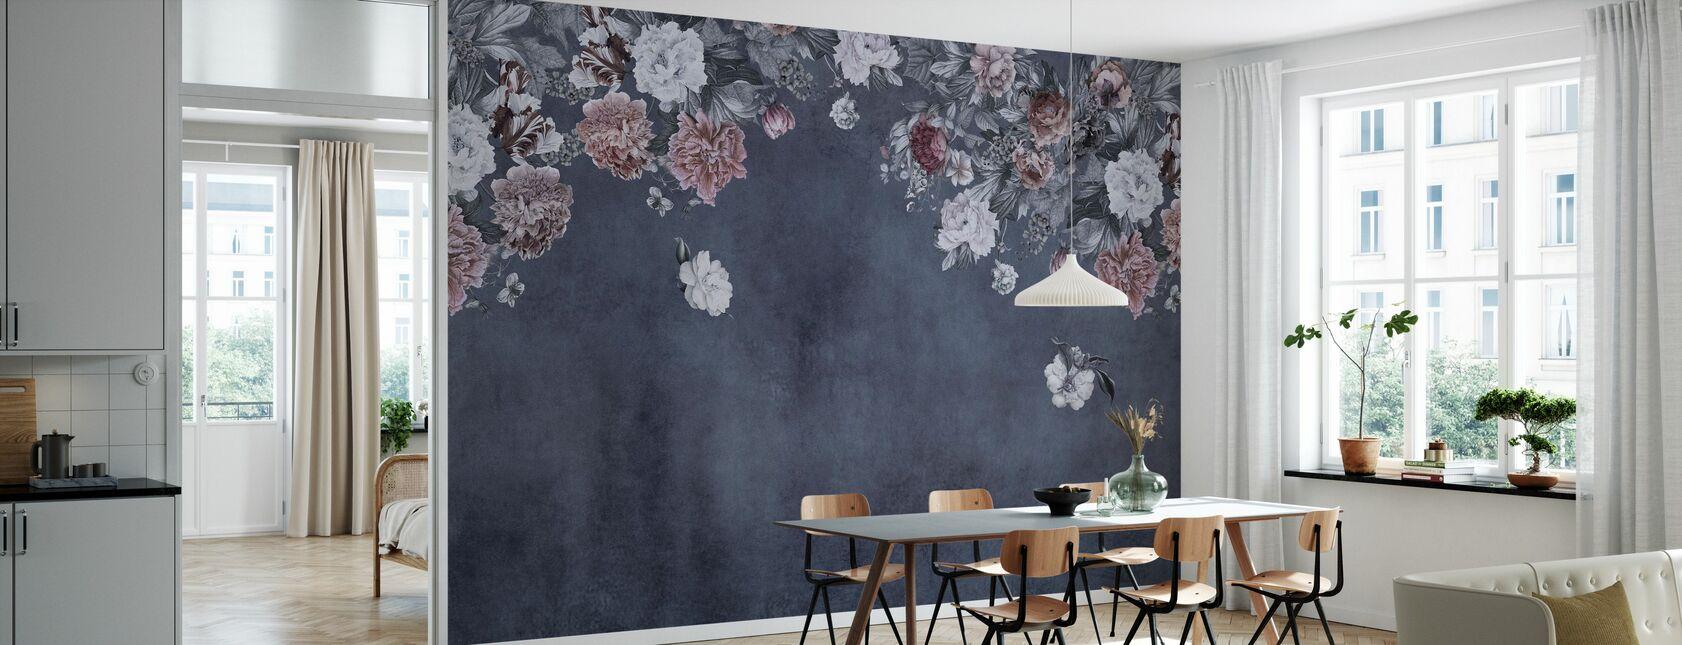 Vintage Flower Wall - Blue - Wallpaper - Kitchen